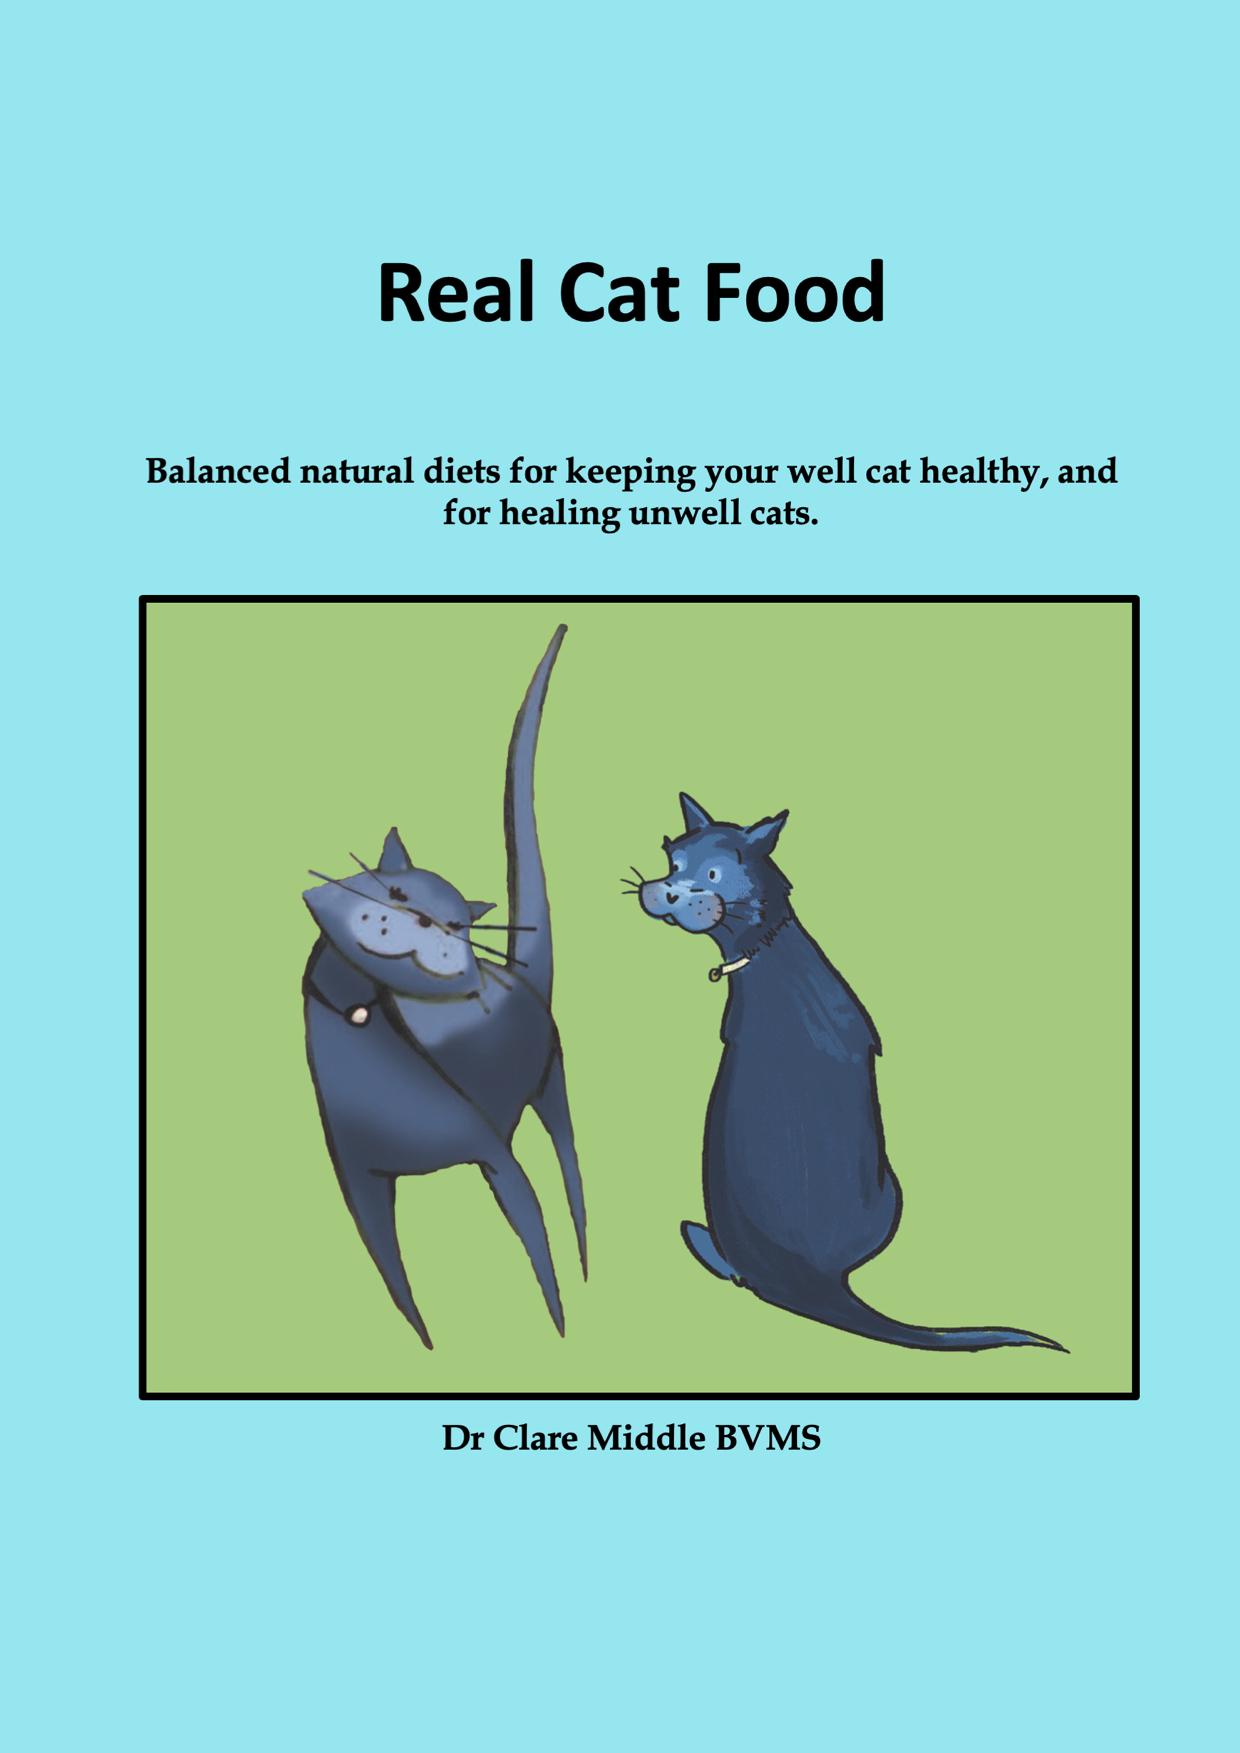 Real Cat Food_Cover_B5.jpeg